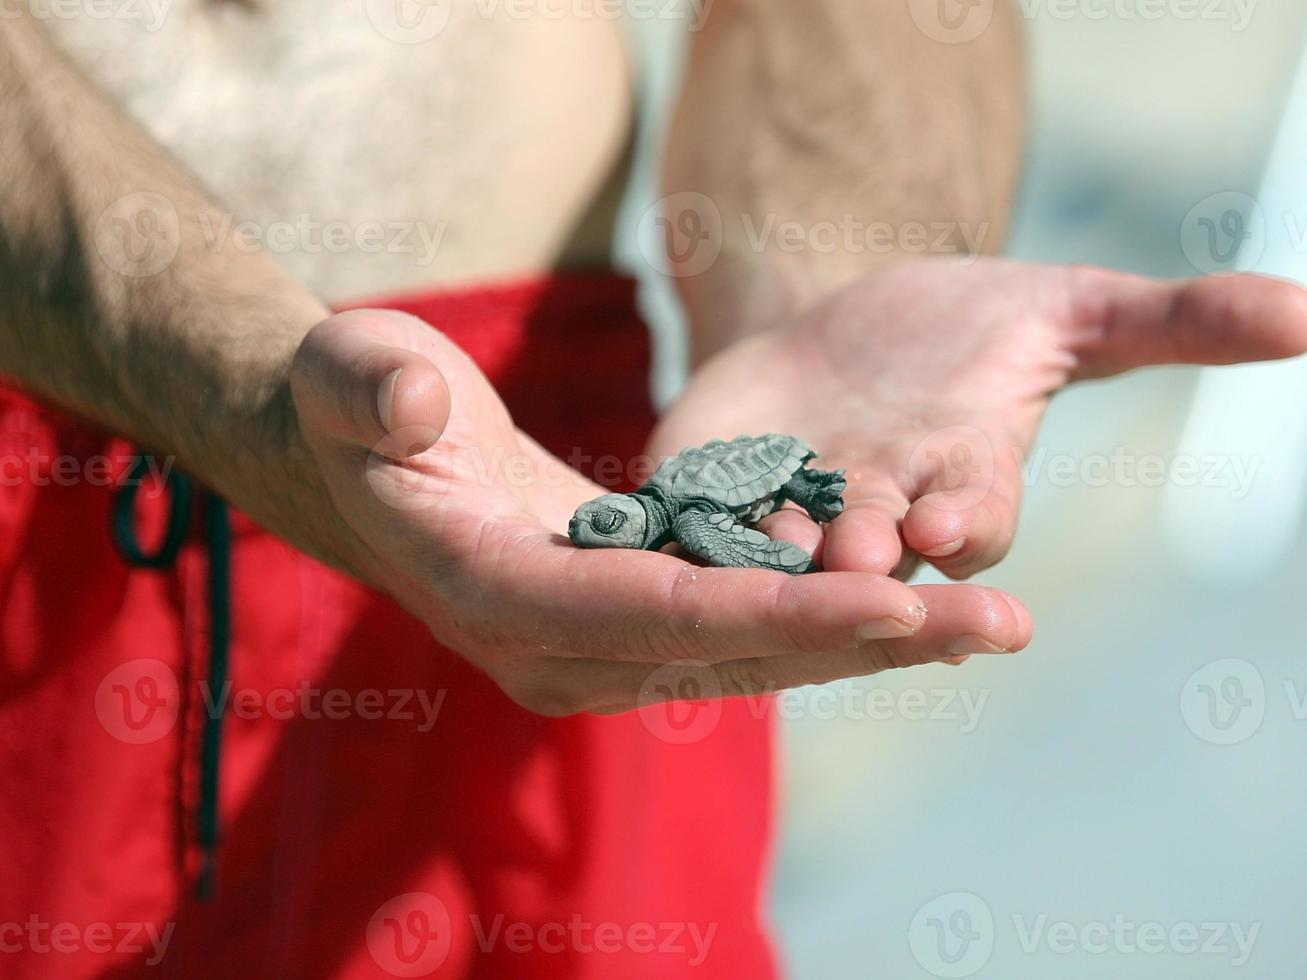 tartaruga recém-nascida foto